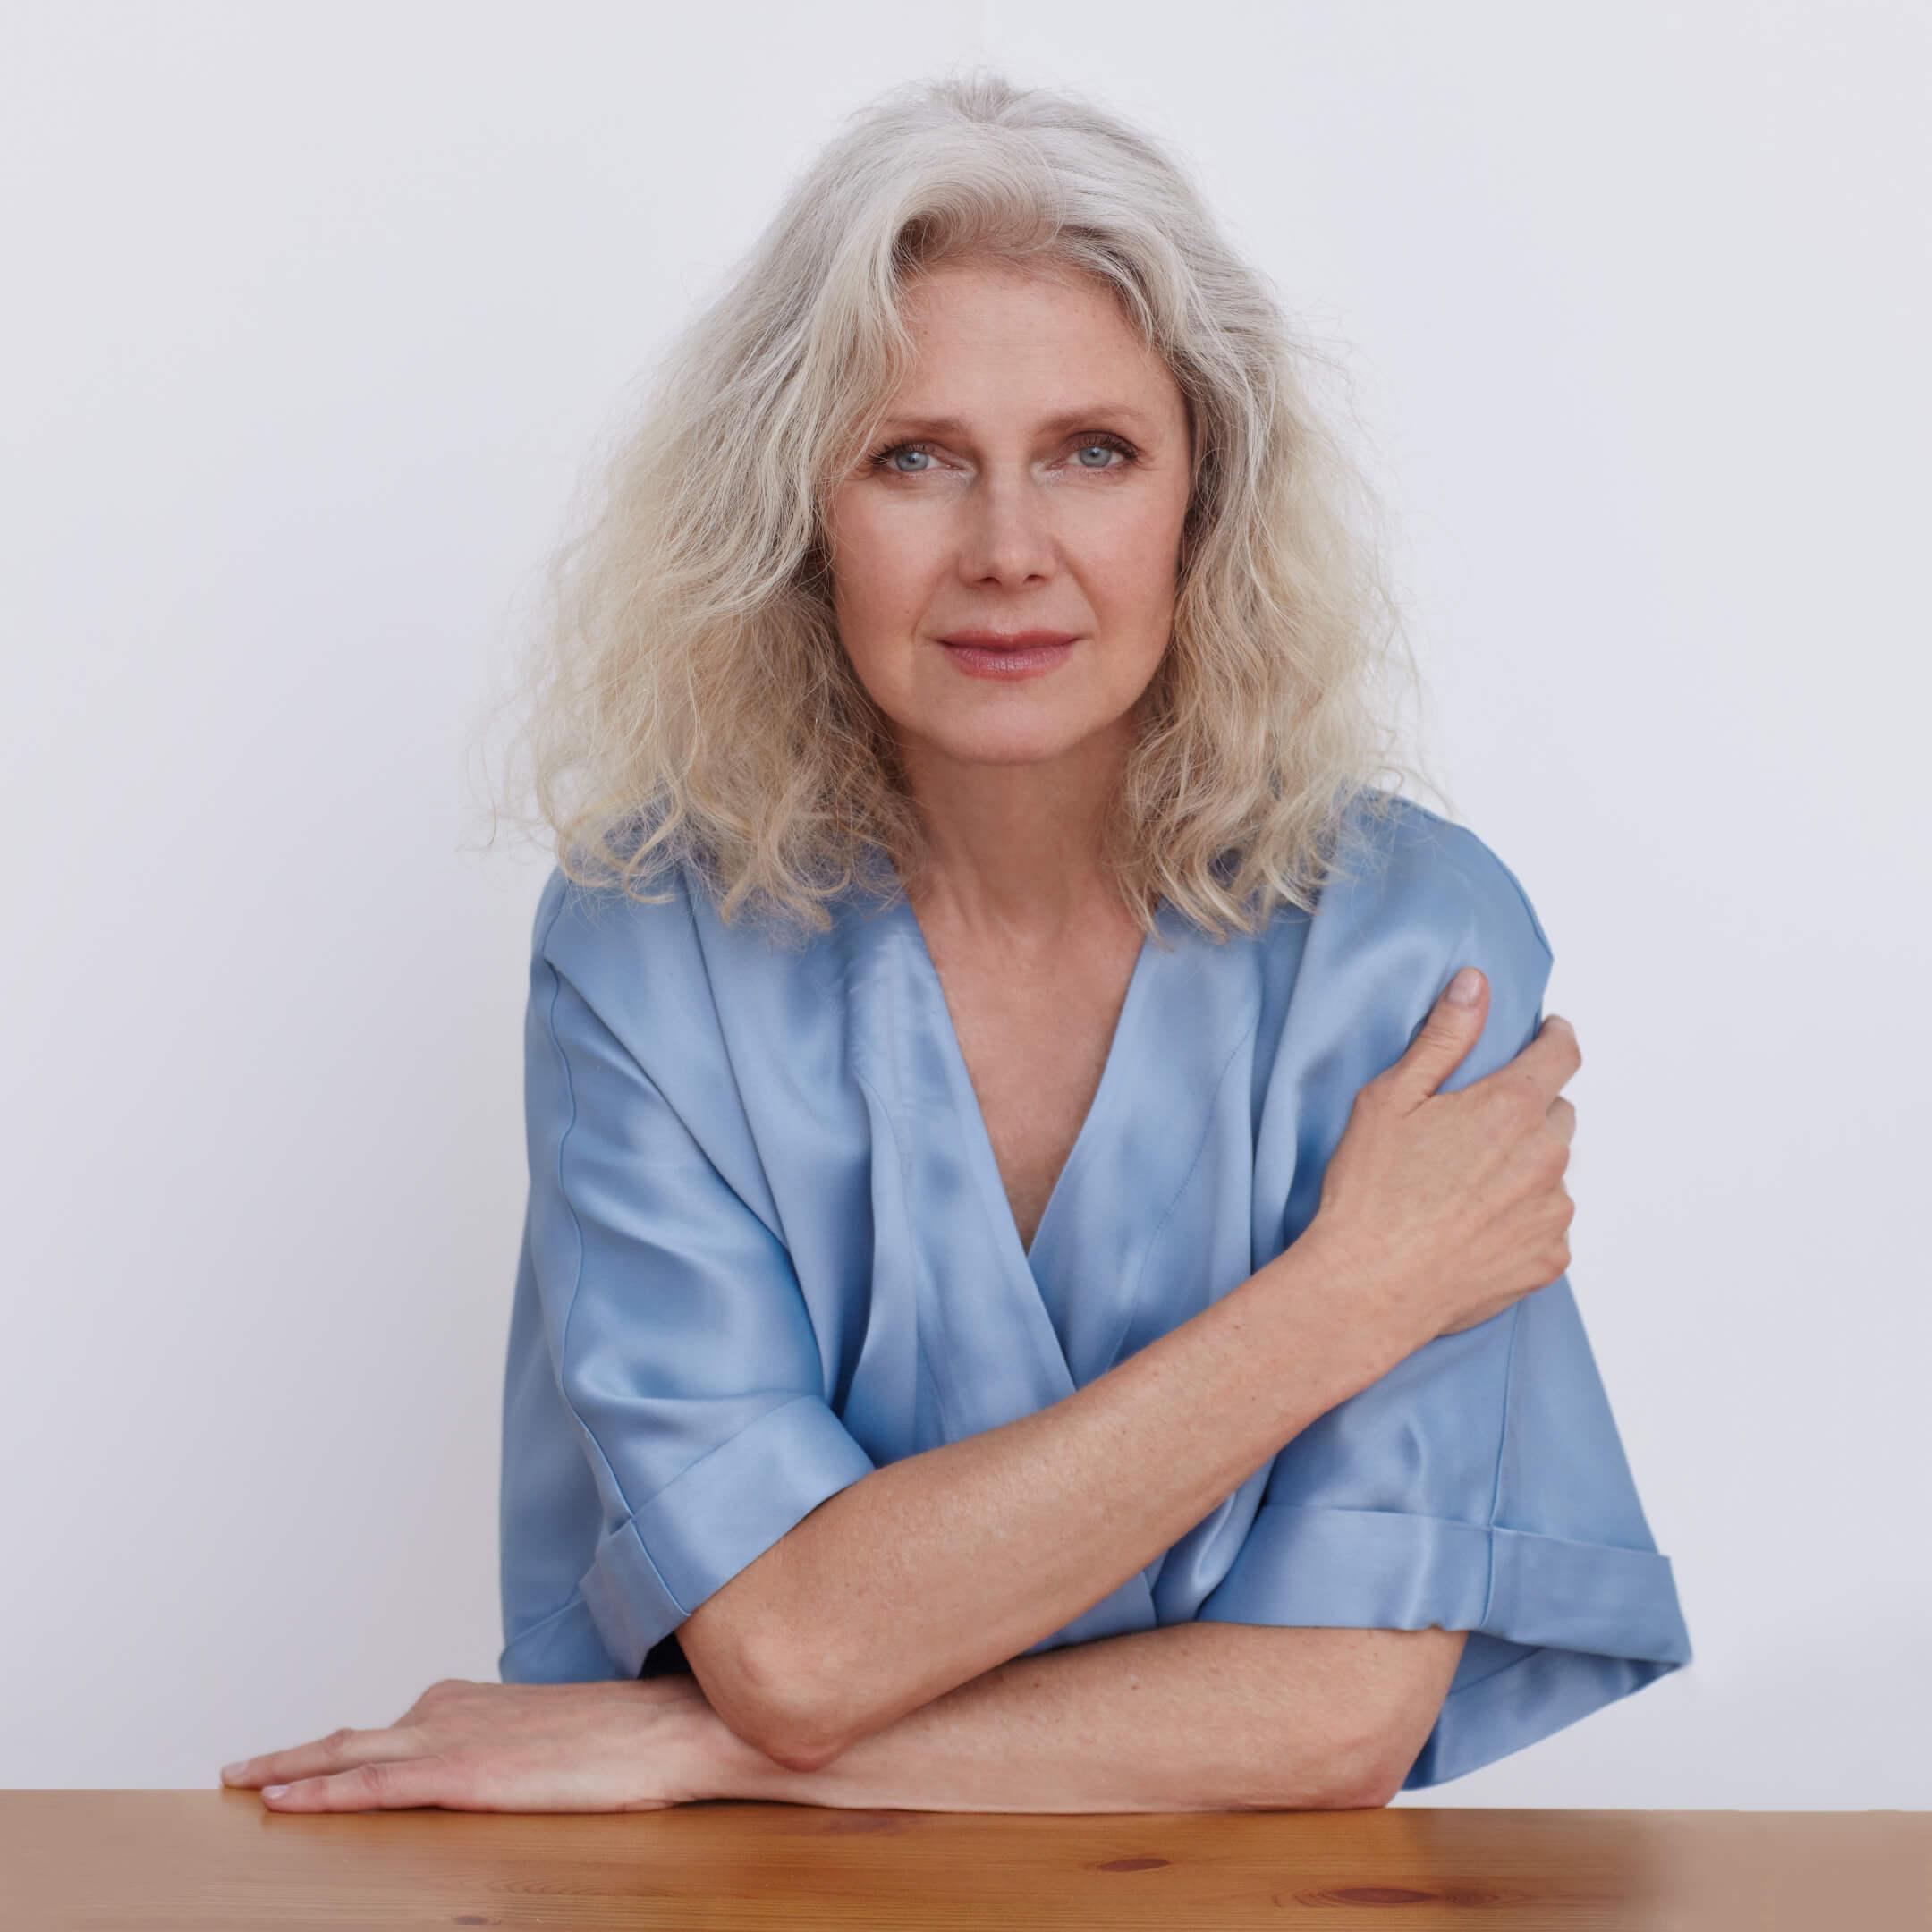 impresionante mujer de pelo blanco